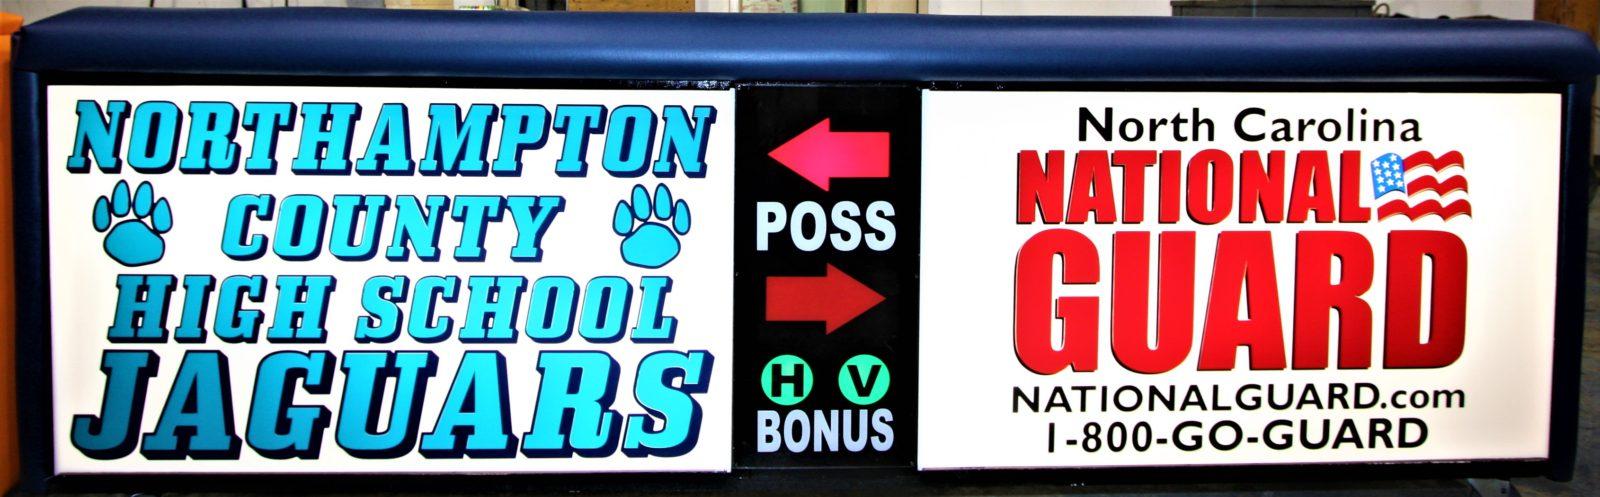 Northhampton high school scoring table North Carolina National Guard NCARNG